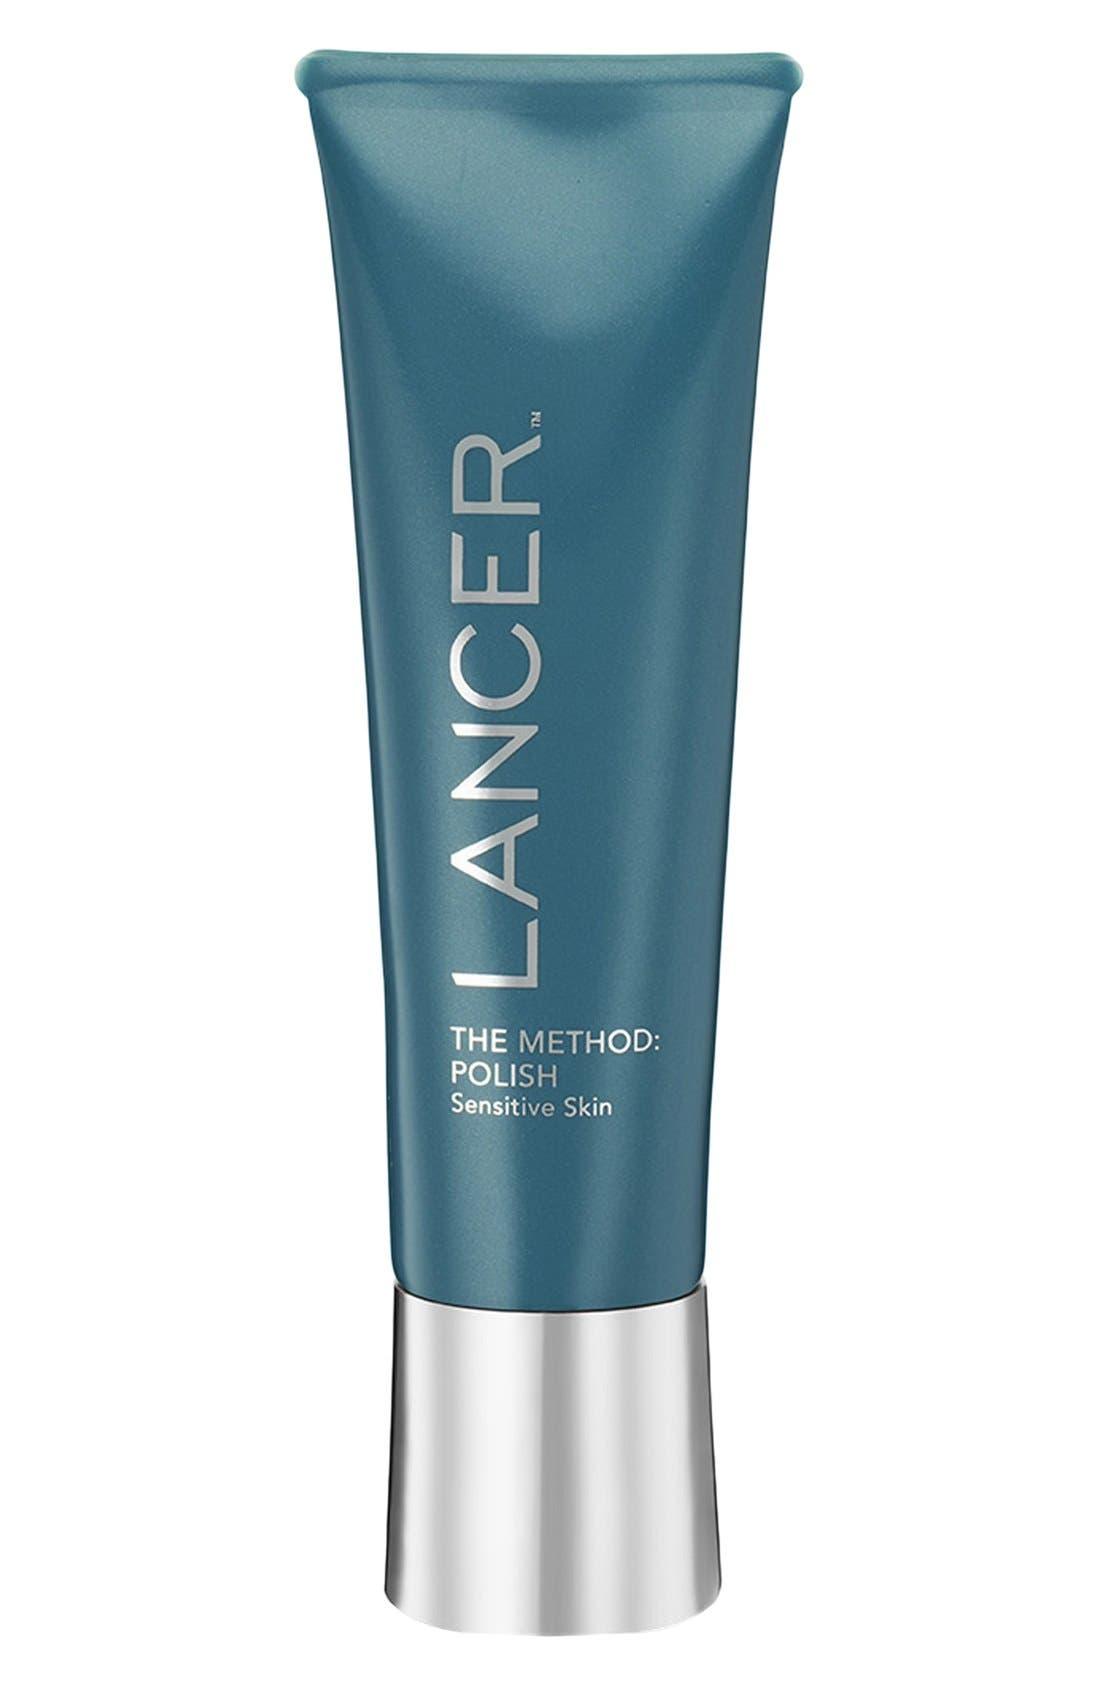 LANCER Skincare The Method – Polish Sensitive Skin Exfoliator